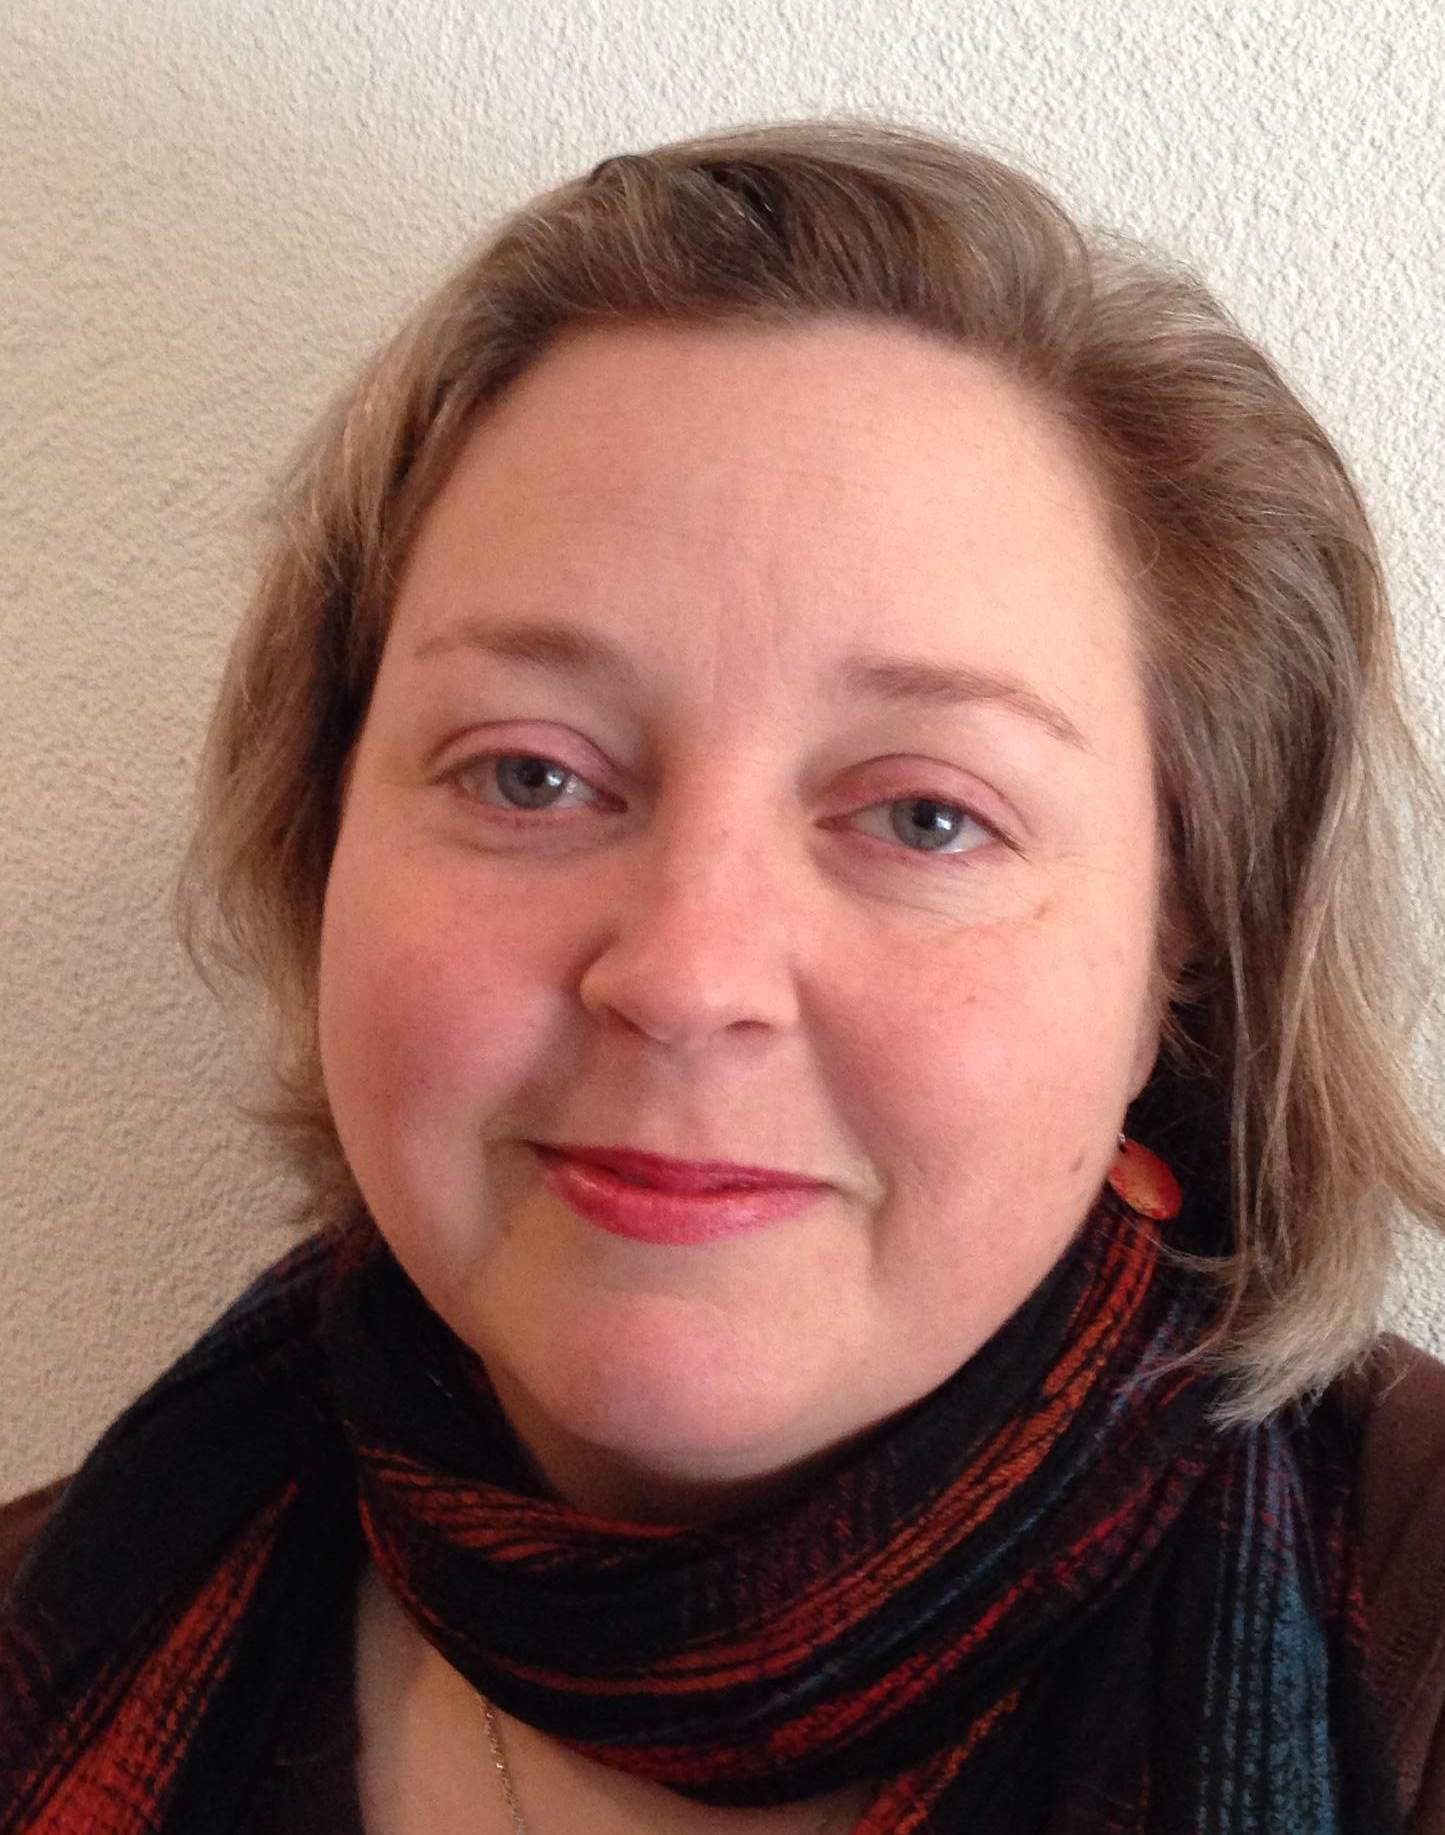 Julia Barton